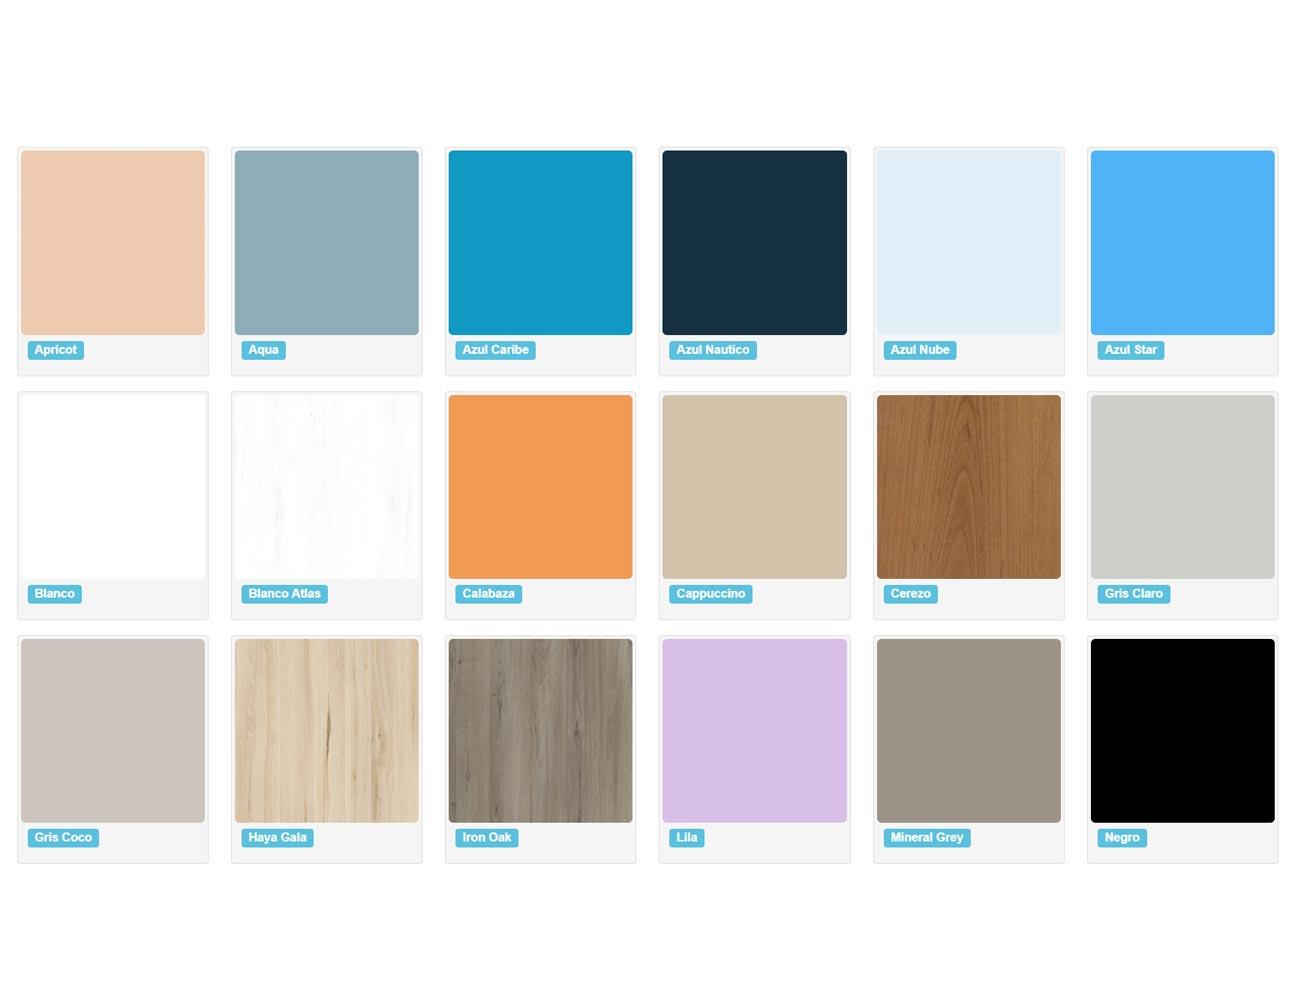 Colores211